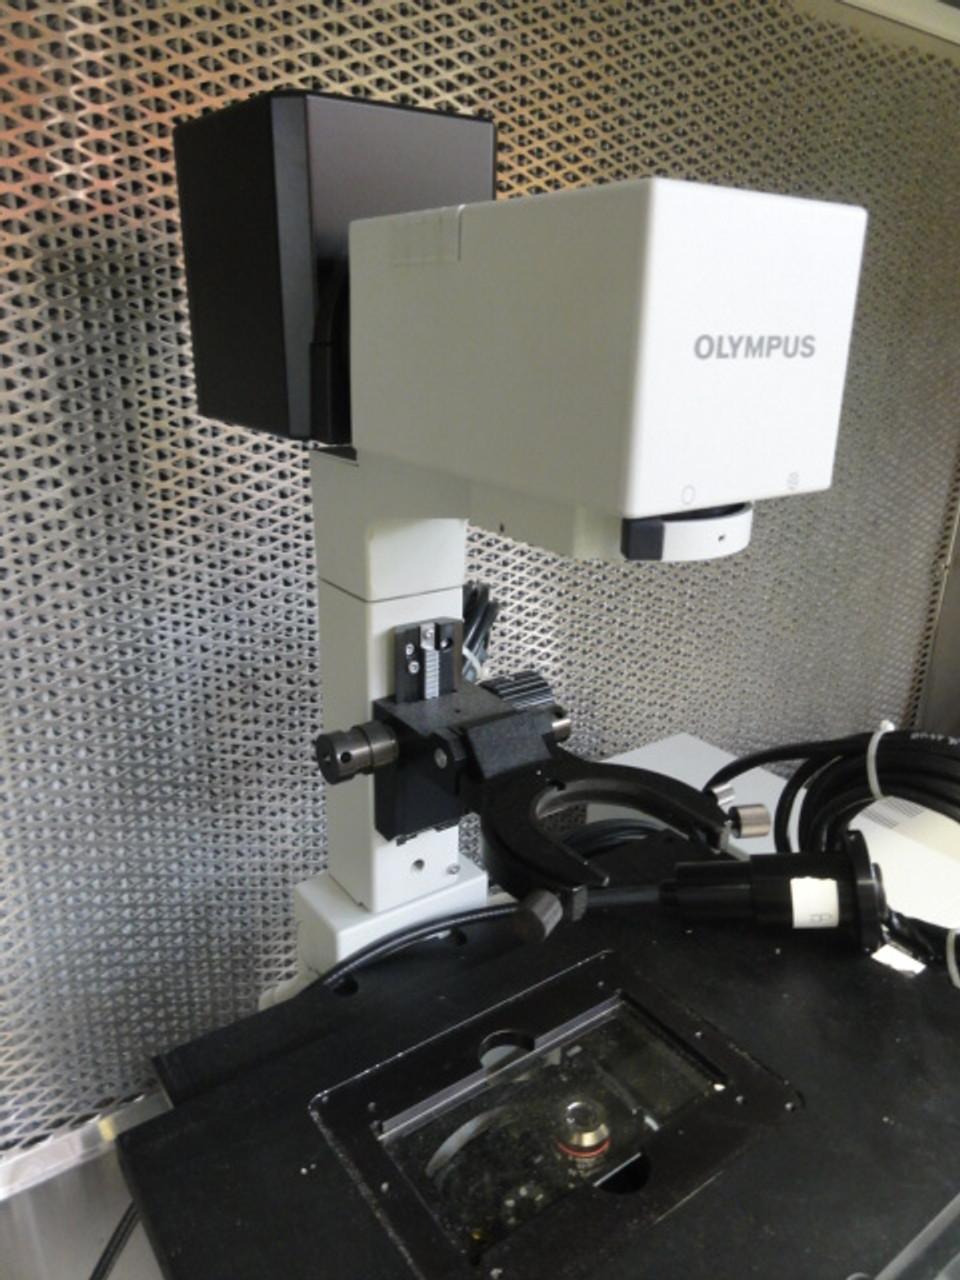 Olympus IX81 Microscope Inverted Fluorescence Microscope- See Description